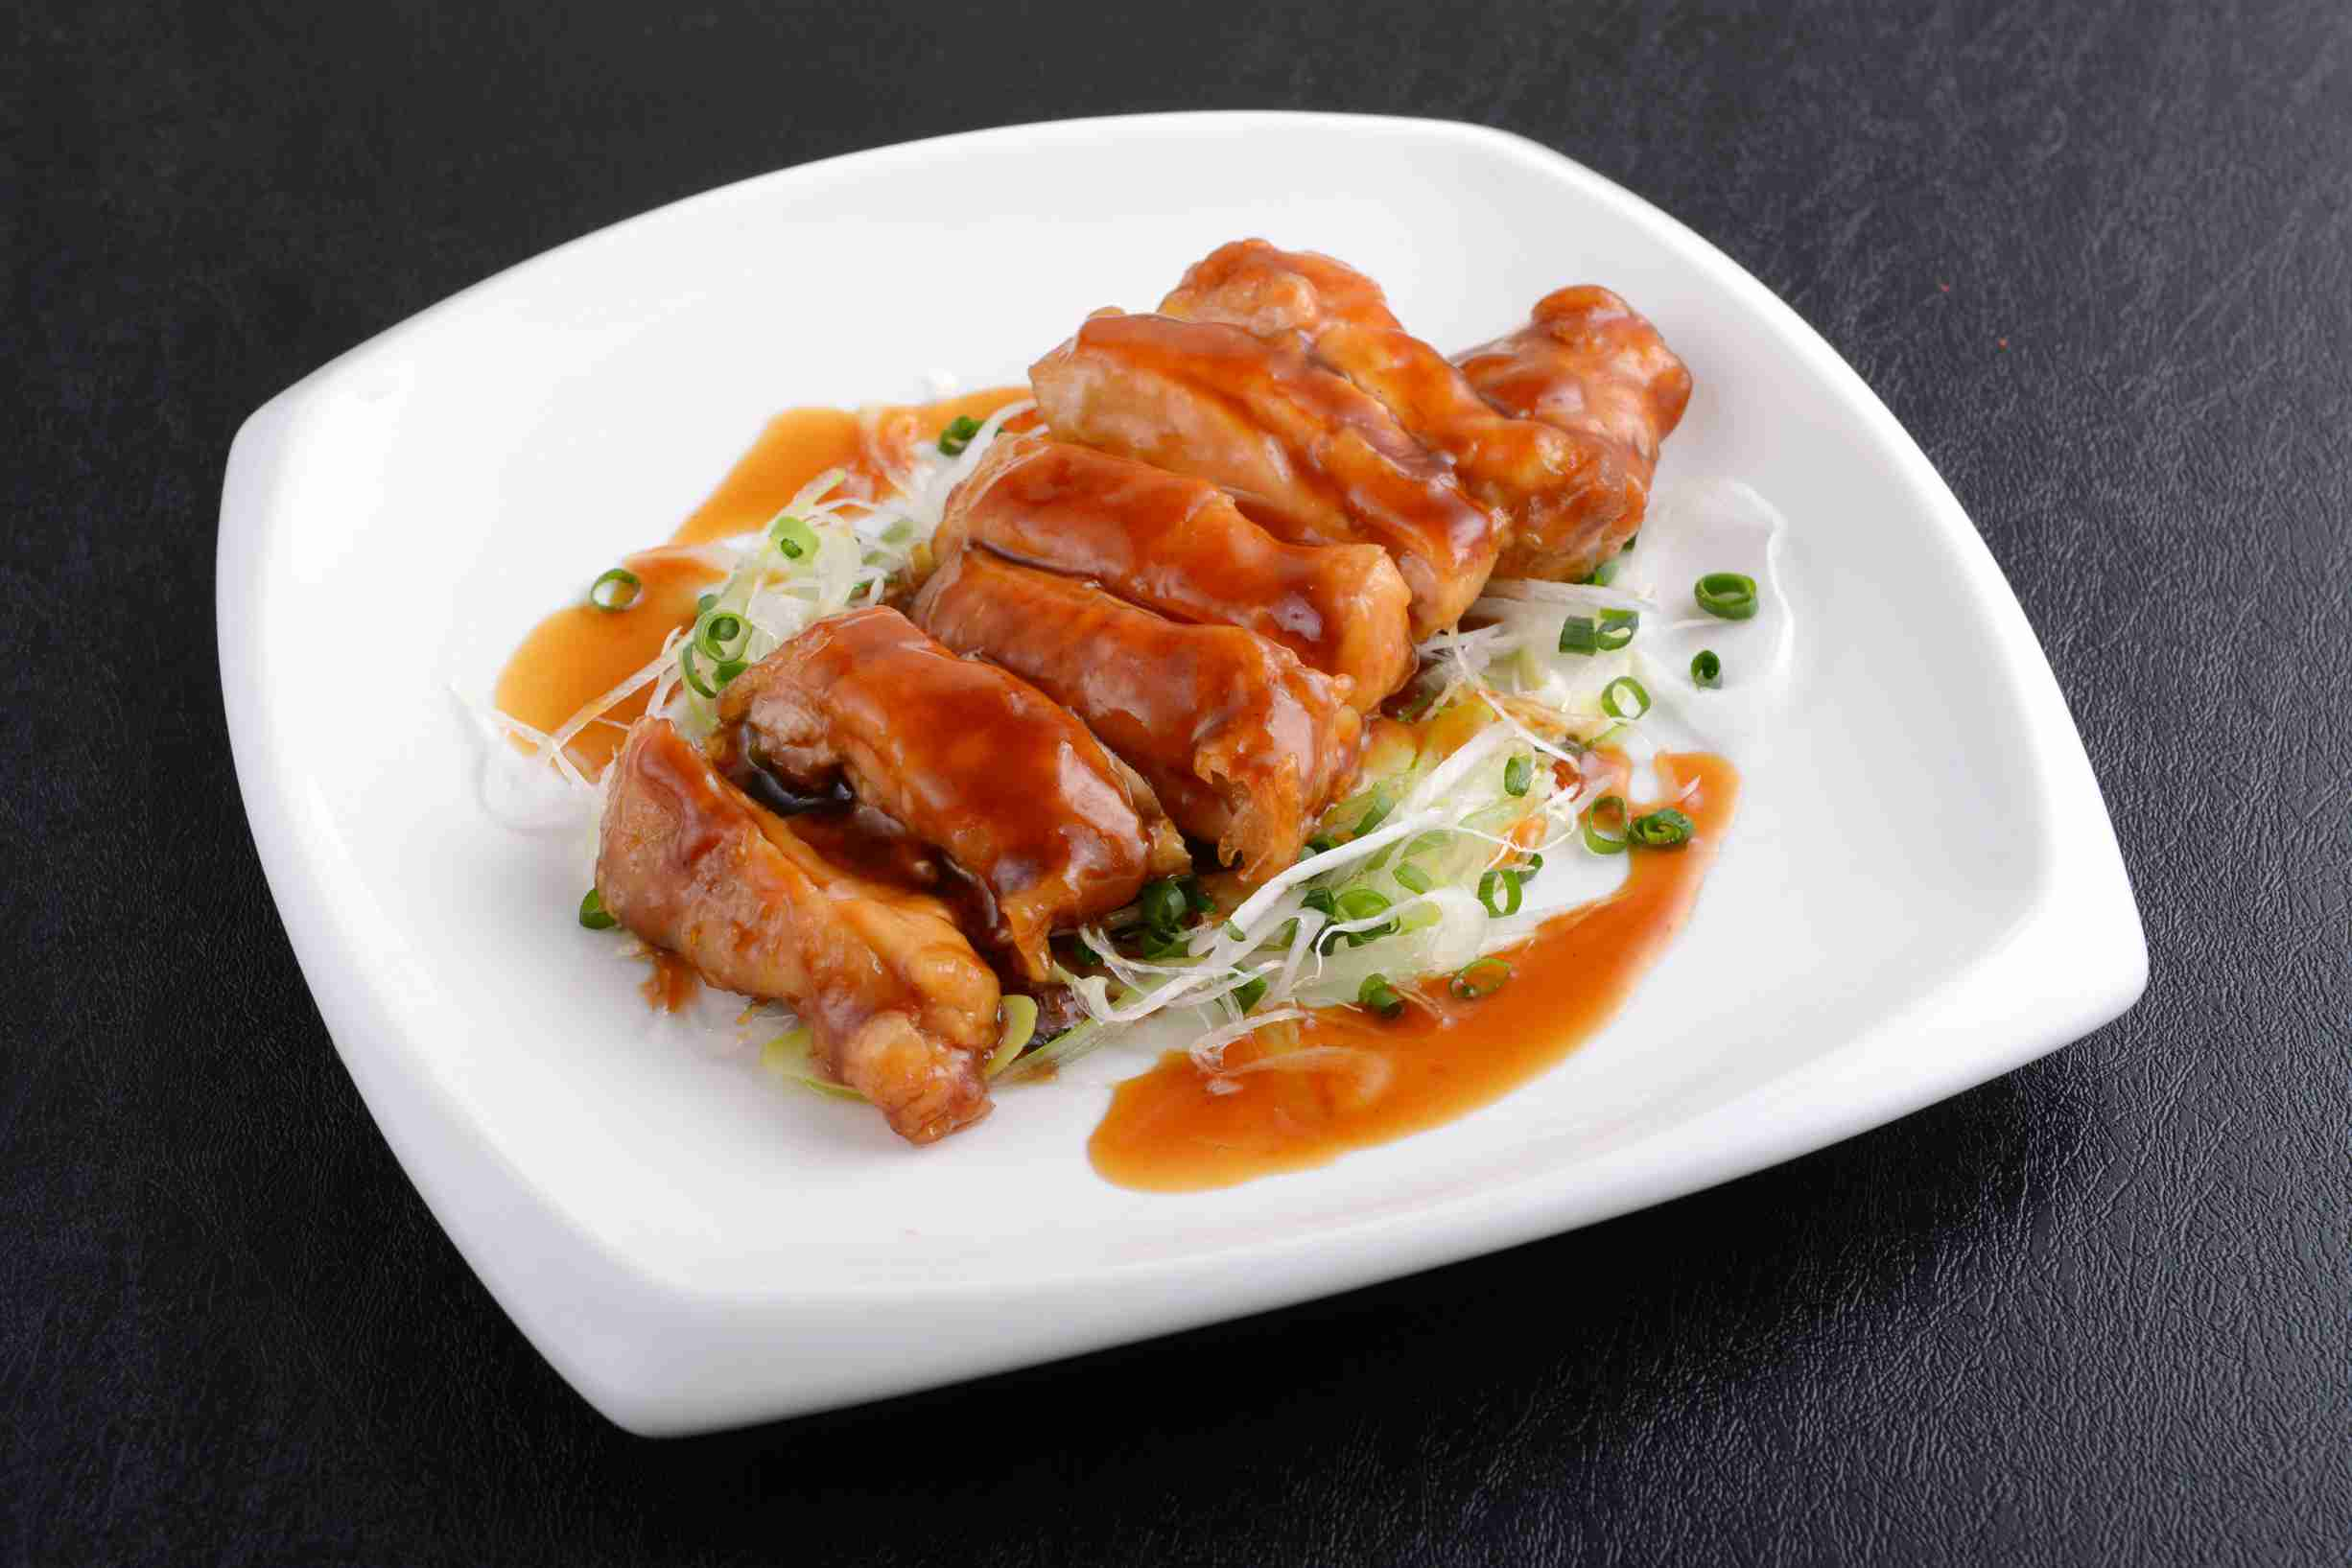 Teriyaki Chicken ($8.00)